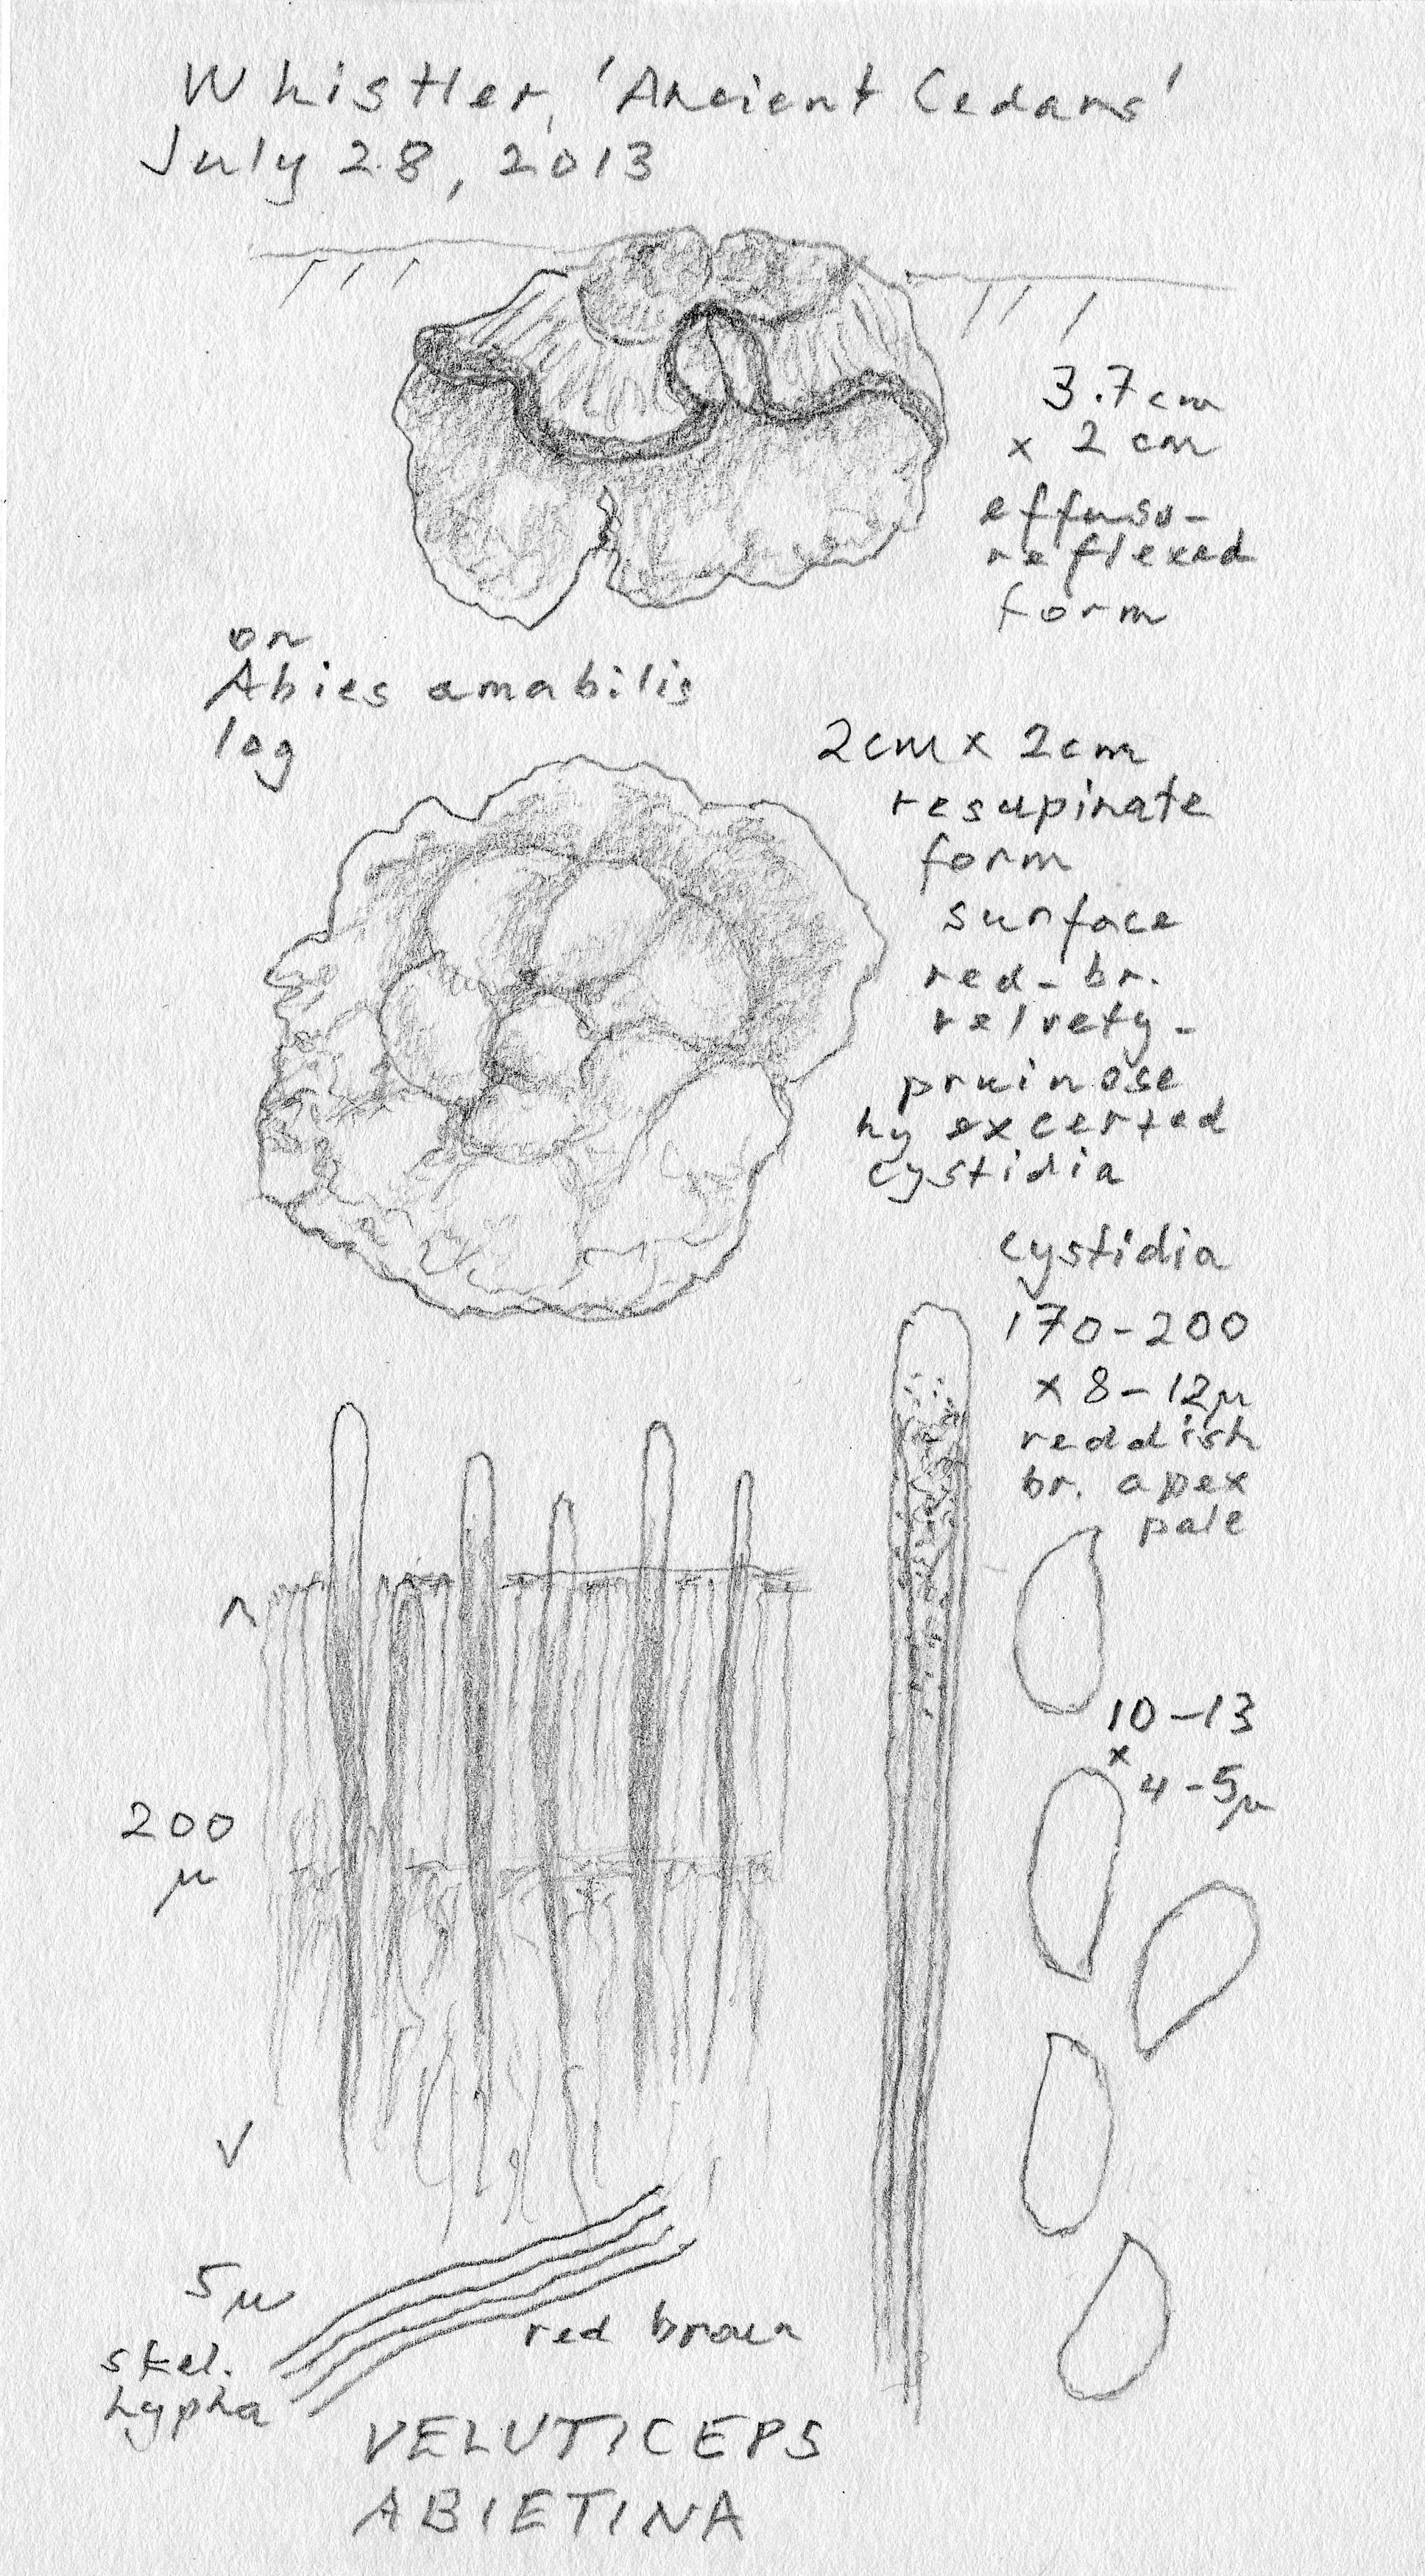 Veluticeps abietina image